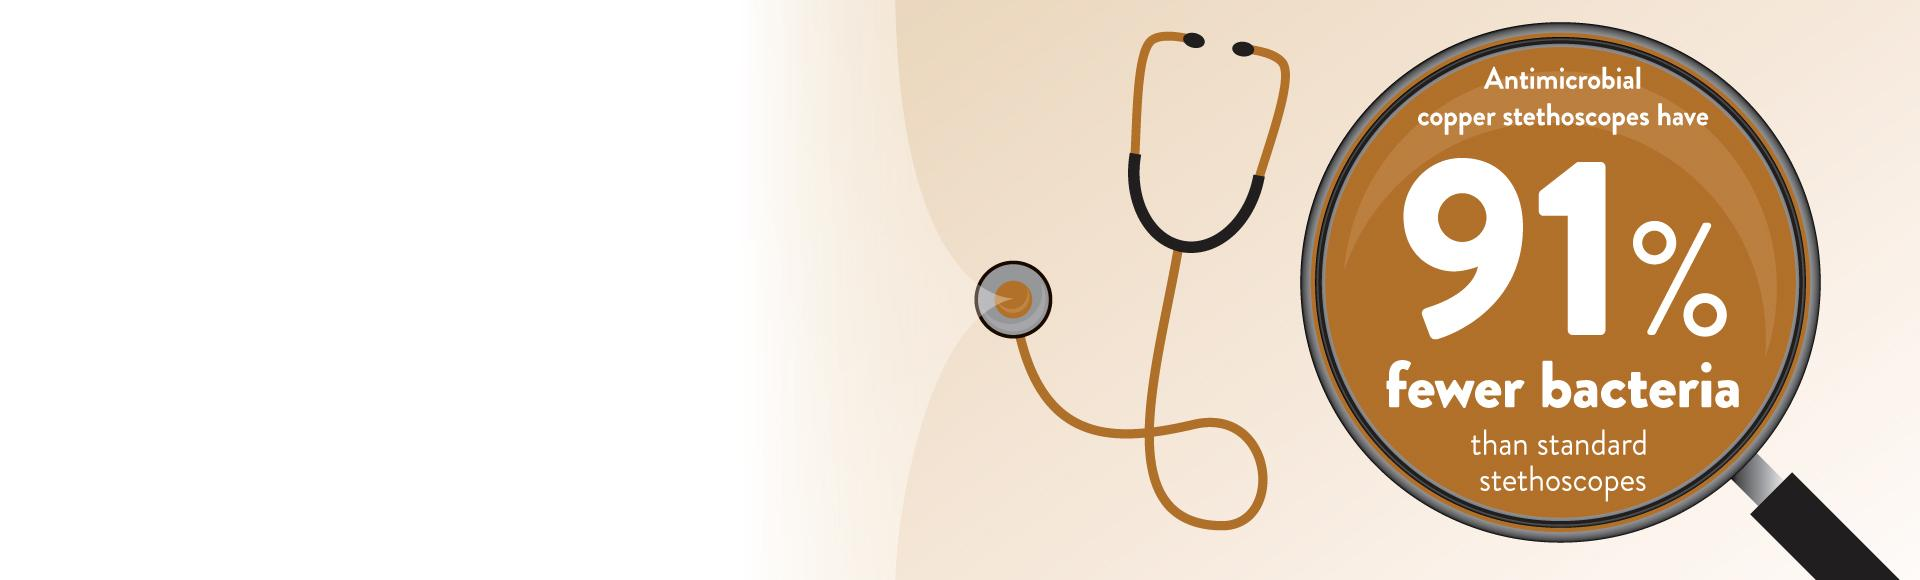 Fewer bacteria on stethoscope